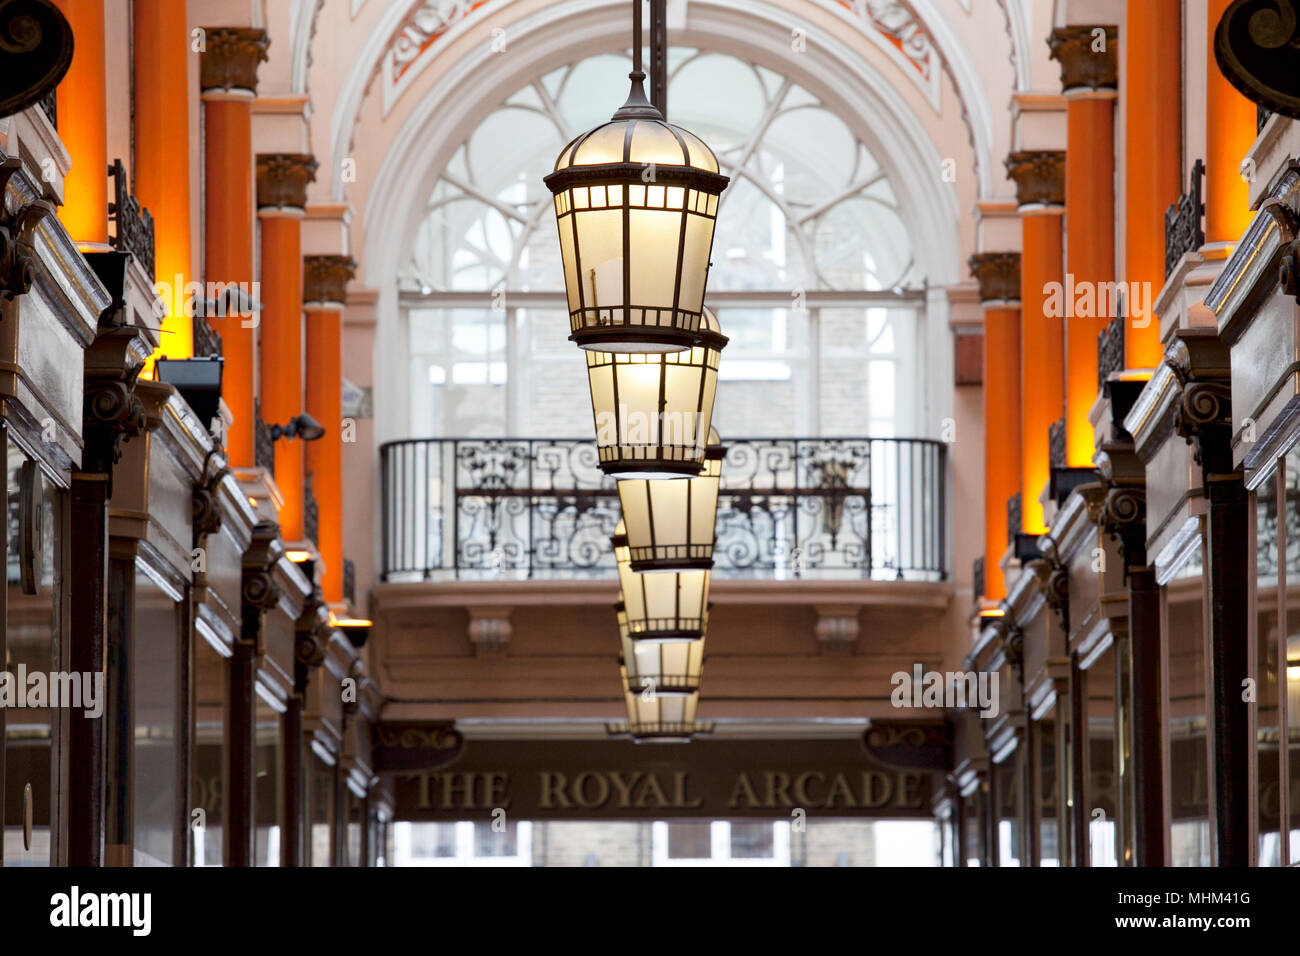 The Royal Arcade London W1 Stock Photo